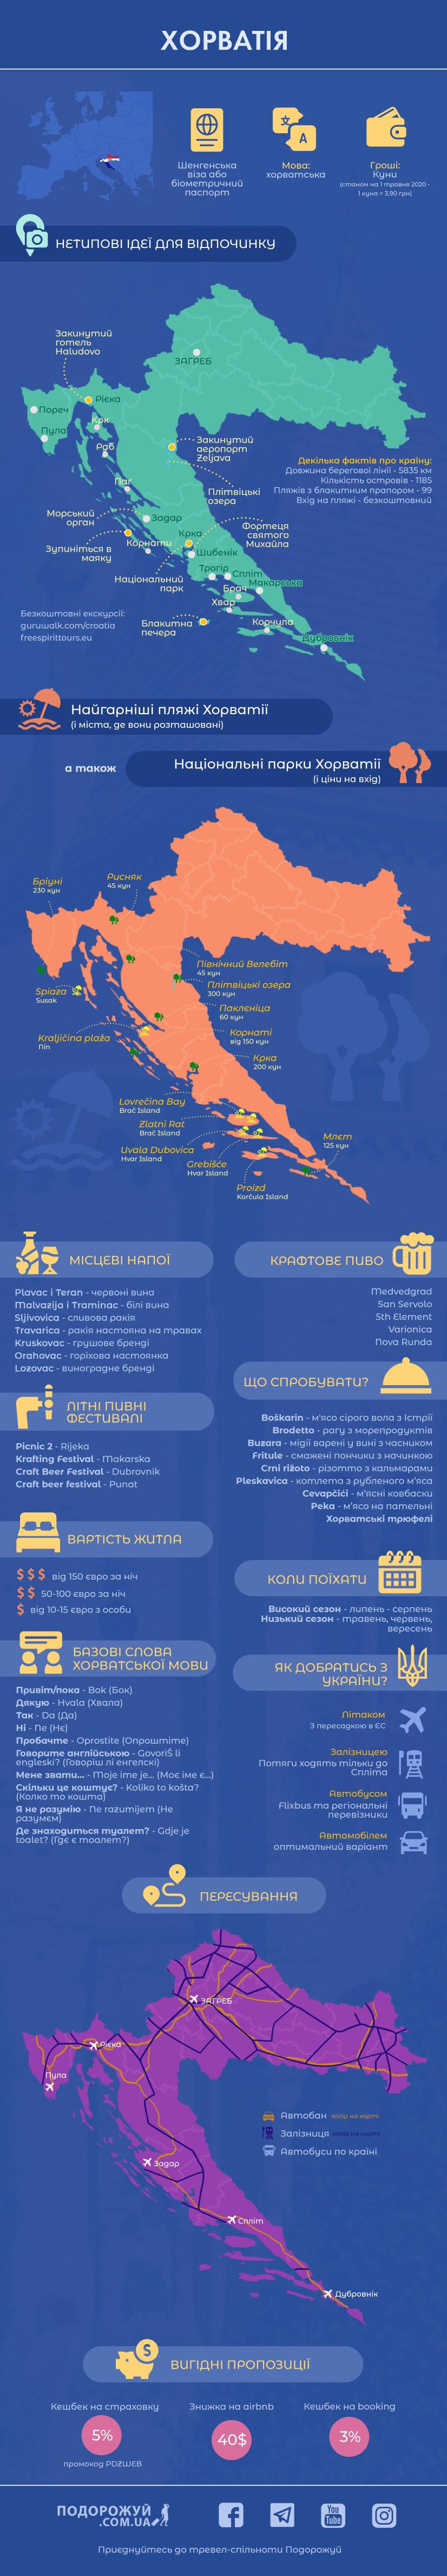 Інфографіка Хорватія зменшена